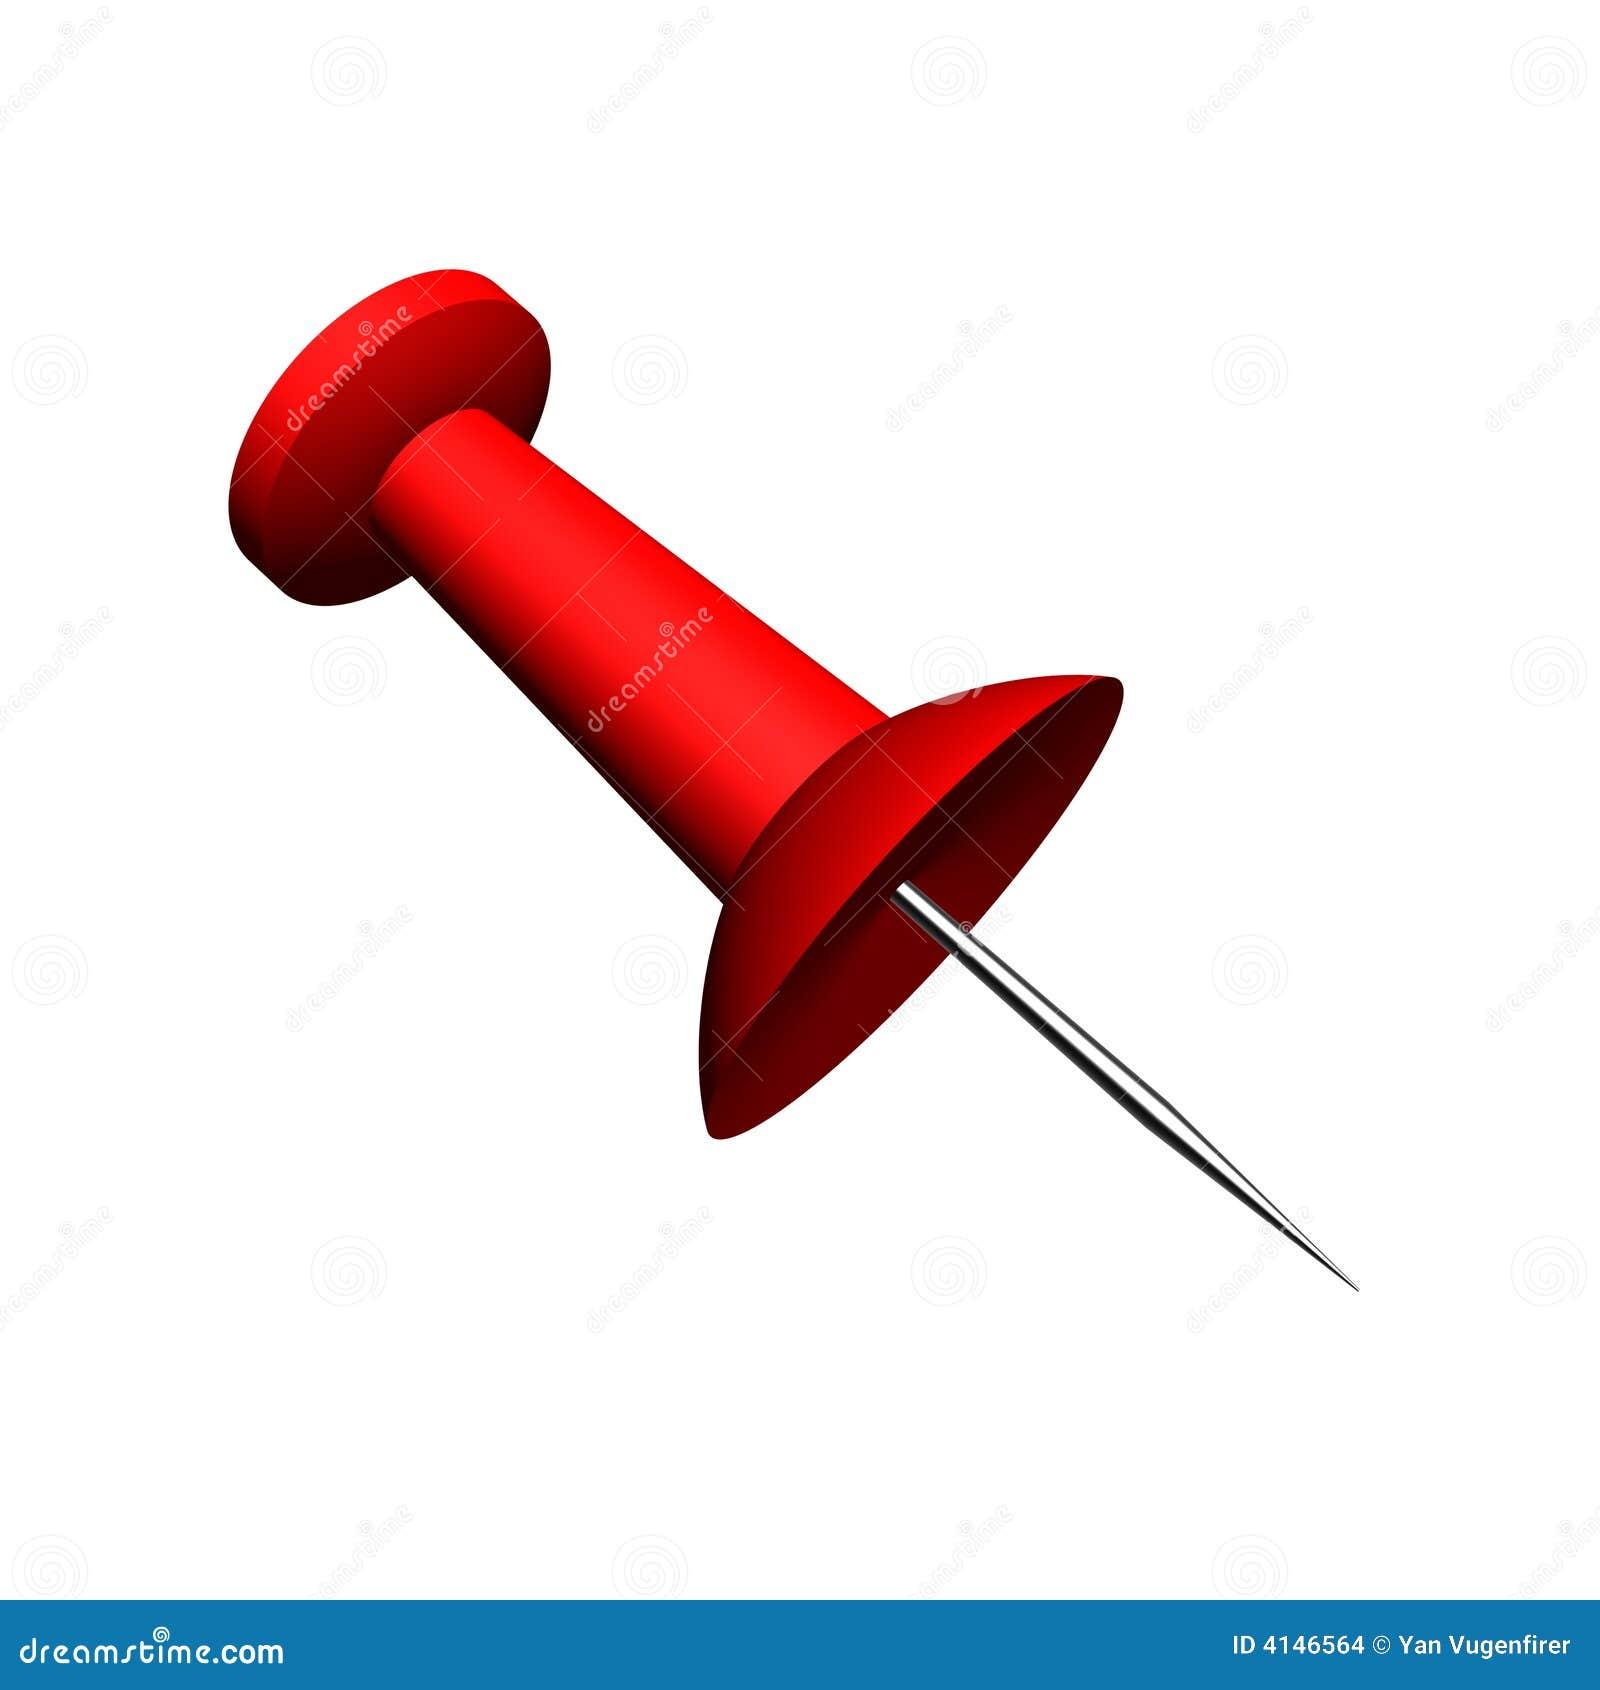 rendez d 39 une grande punaise rouge de bureau illustration stock image 4146564. Black Bedroom Furniture Sets. Home Design Ideas